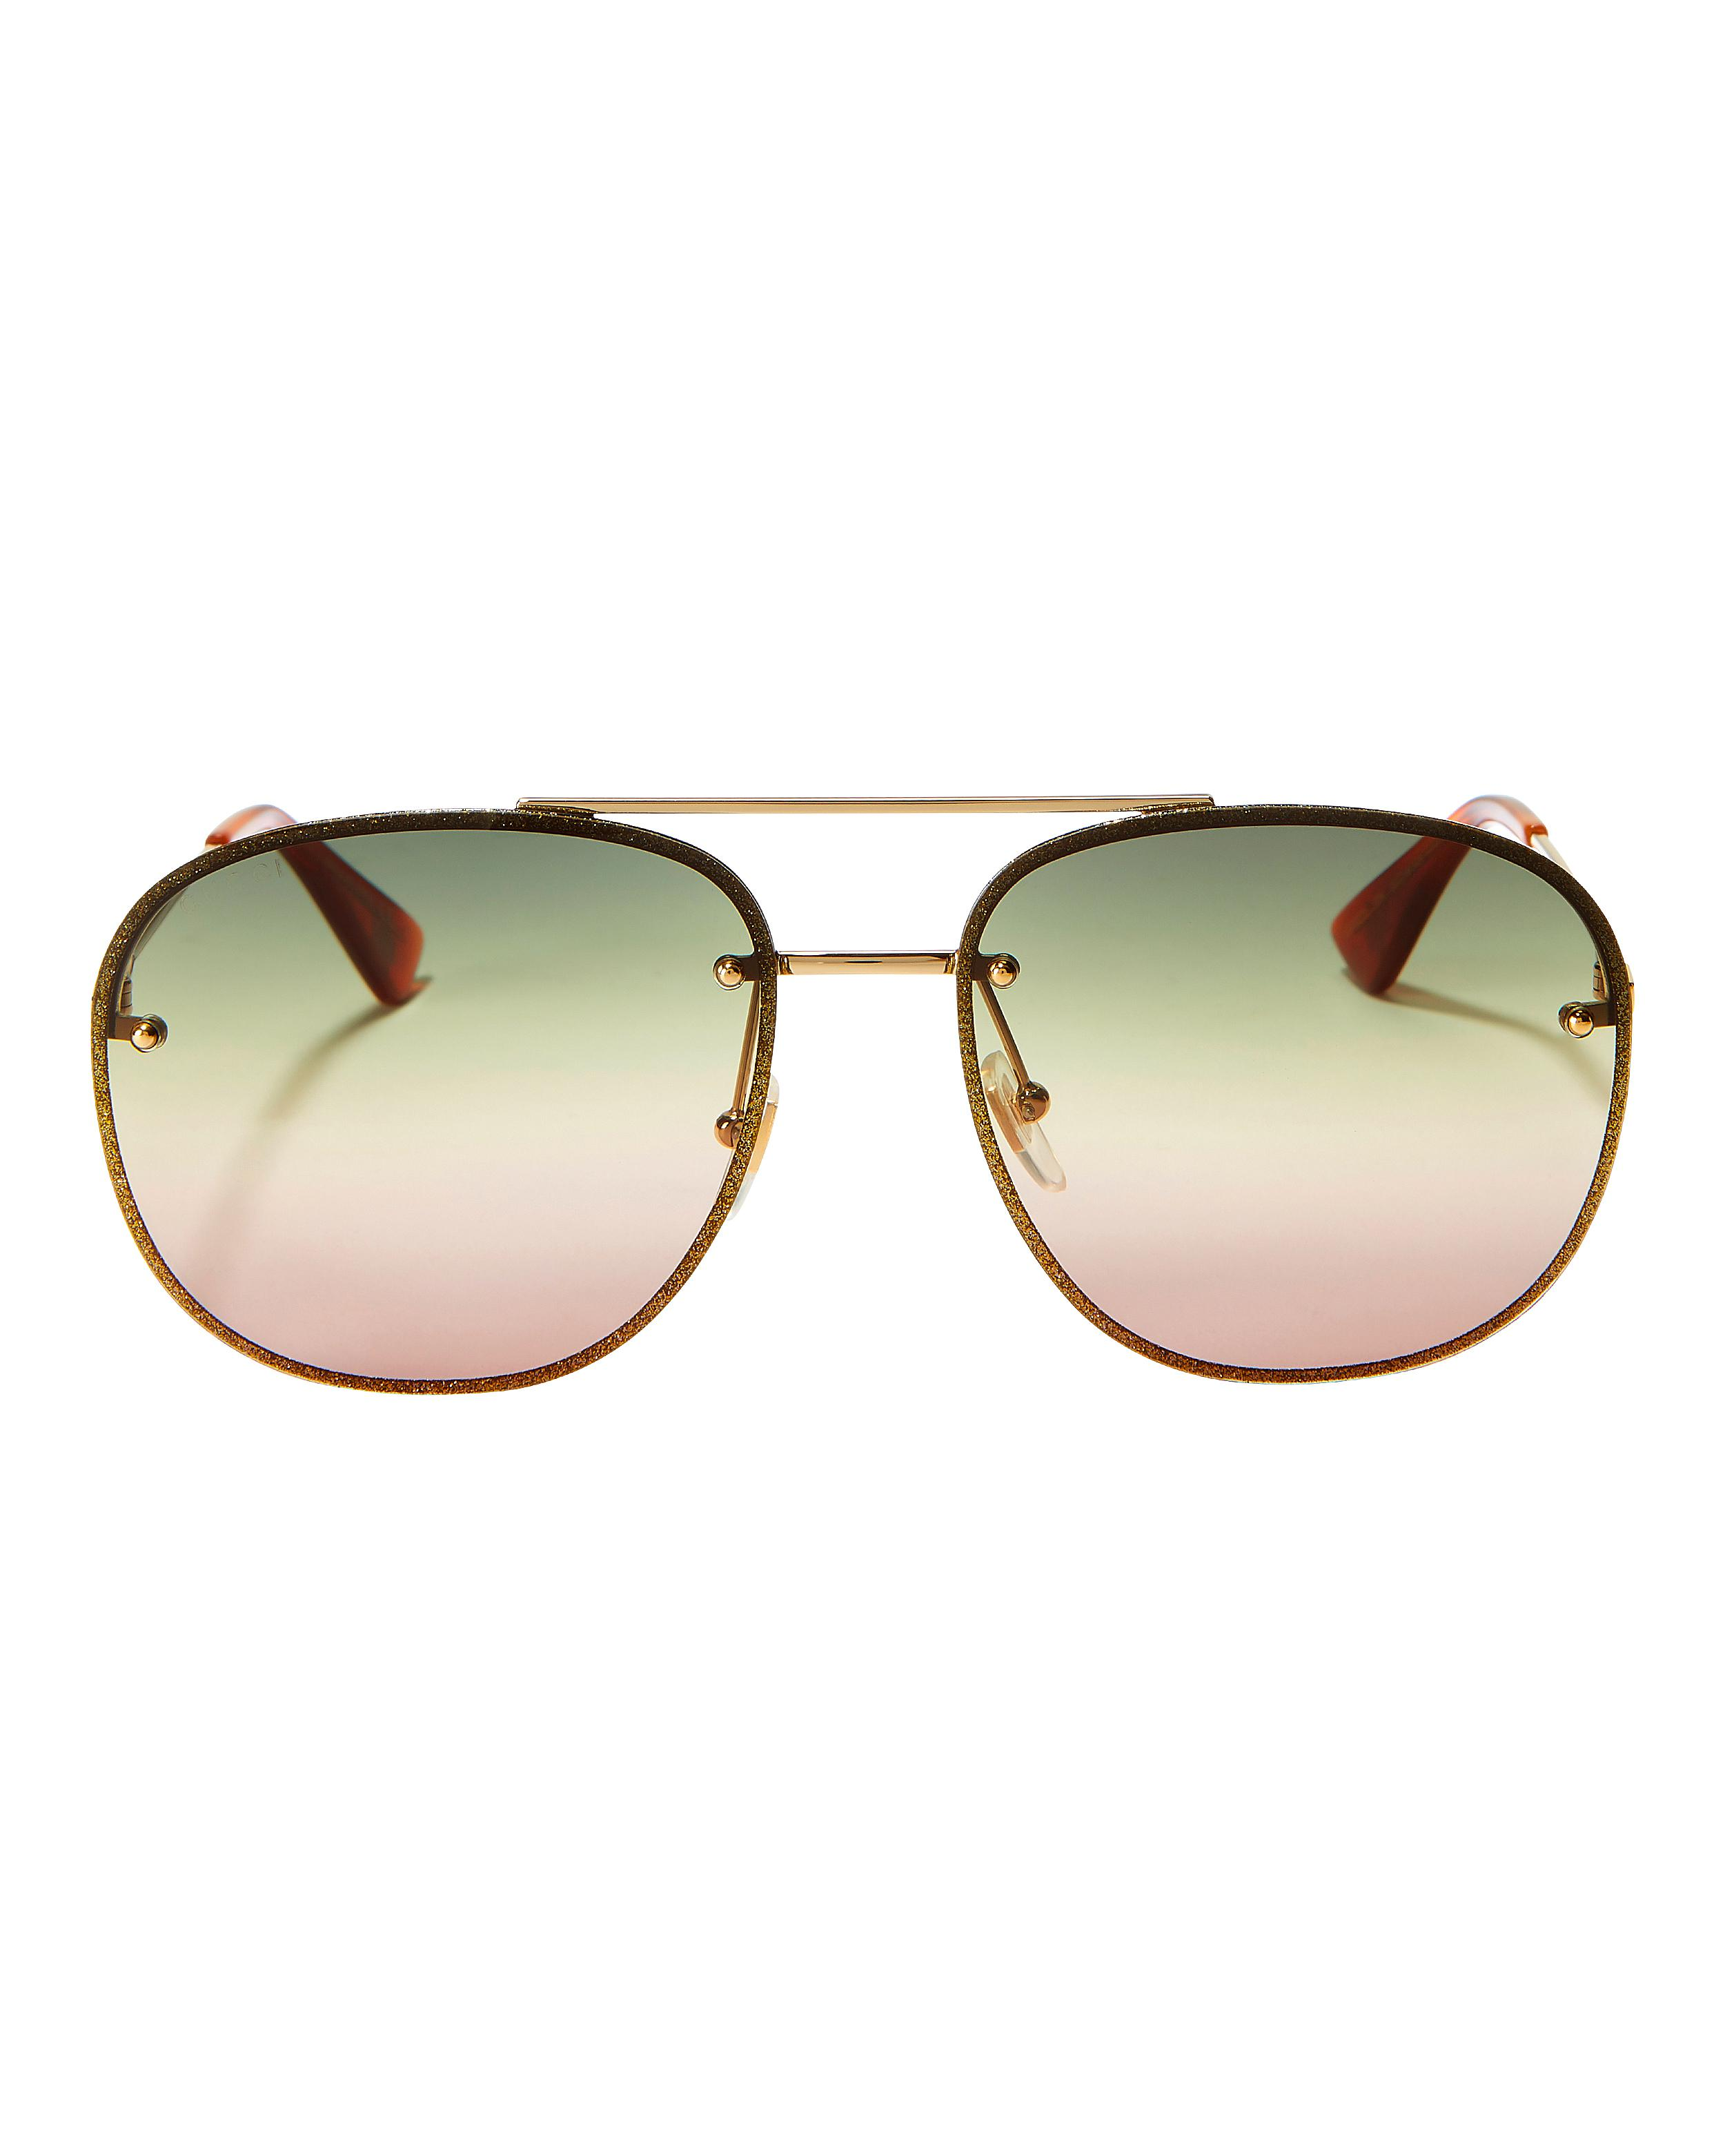 45d61e1bc70d Lyst - Gucci Glitter Aviator Sunglasses in Metallic